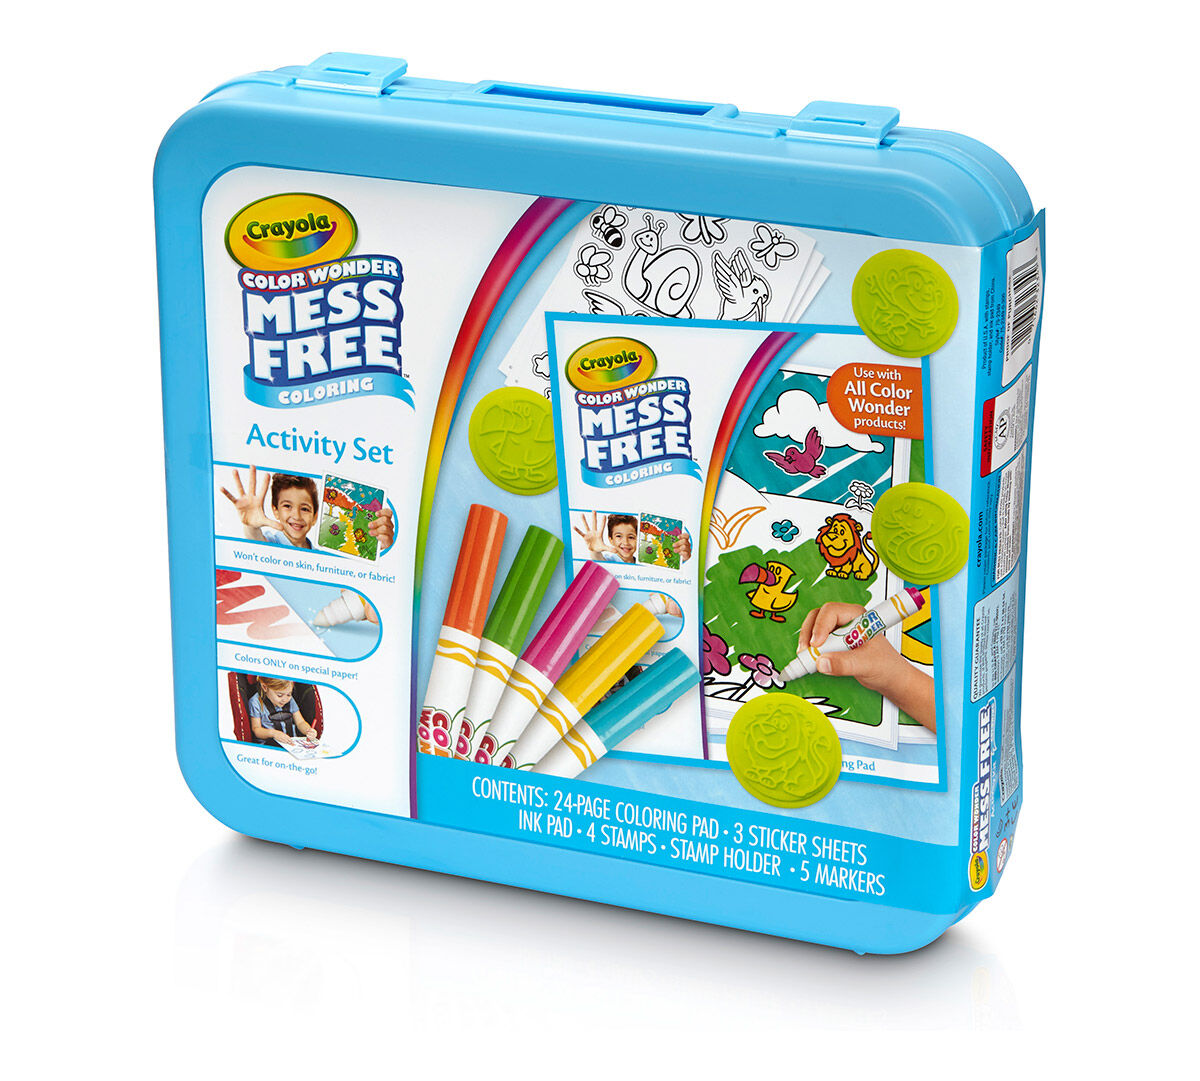 Color Wonder Mess Free Activity Set Crayola